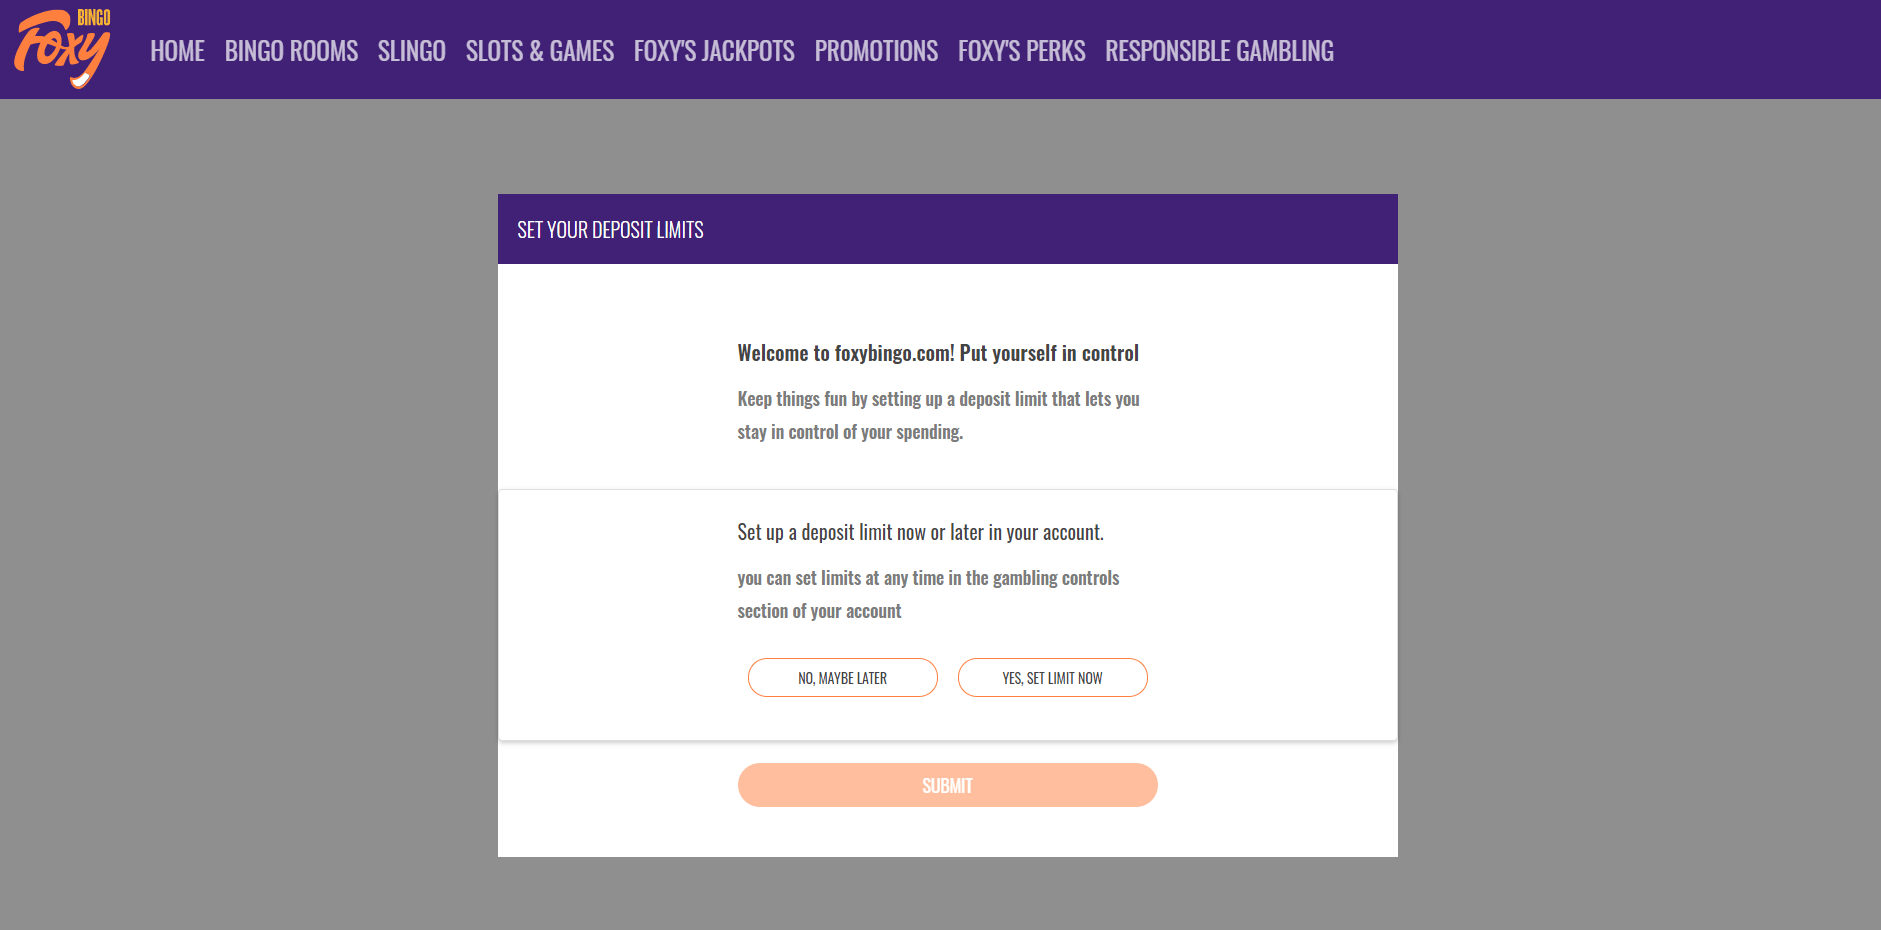 foxy bingo set deposit limits